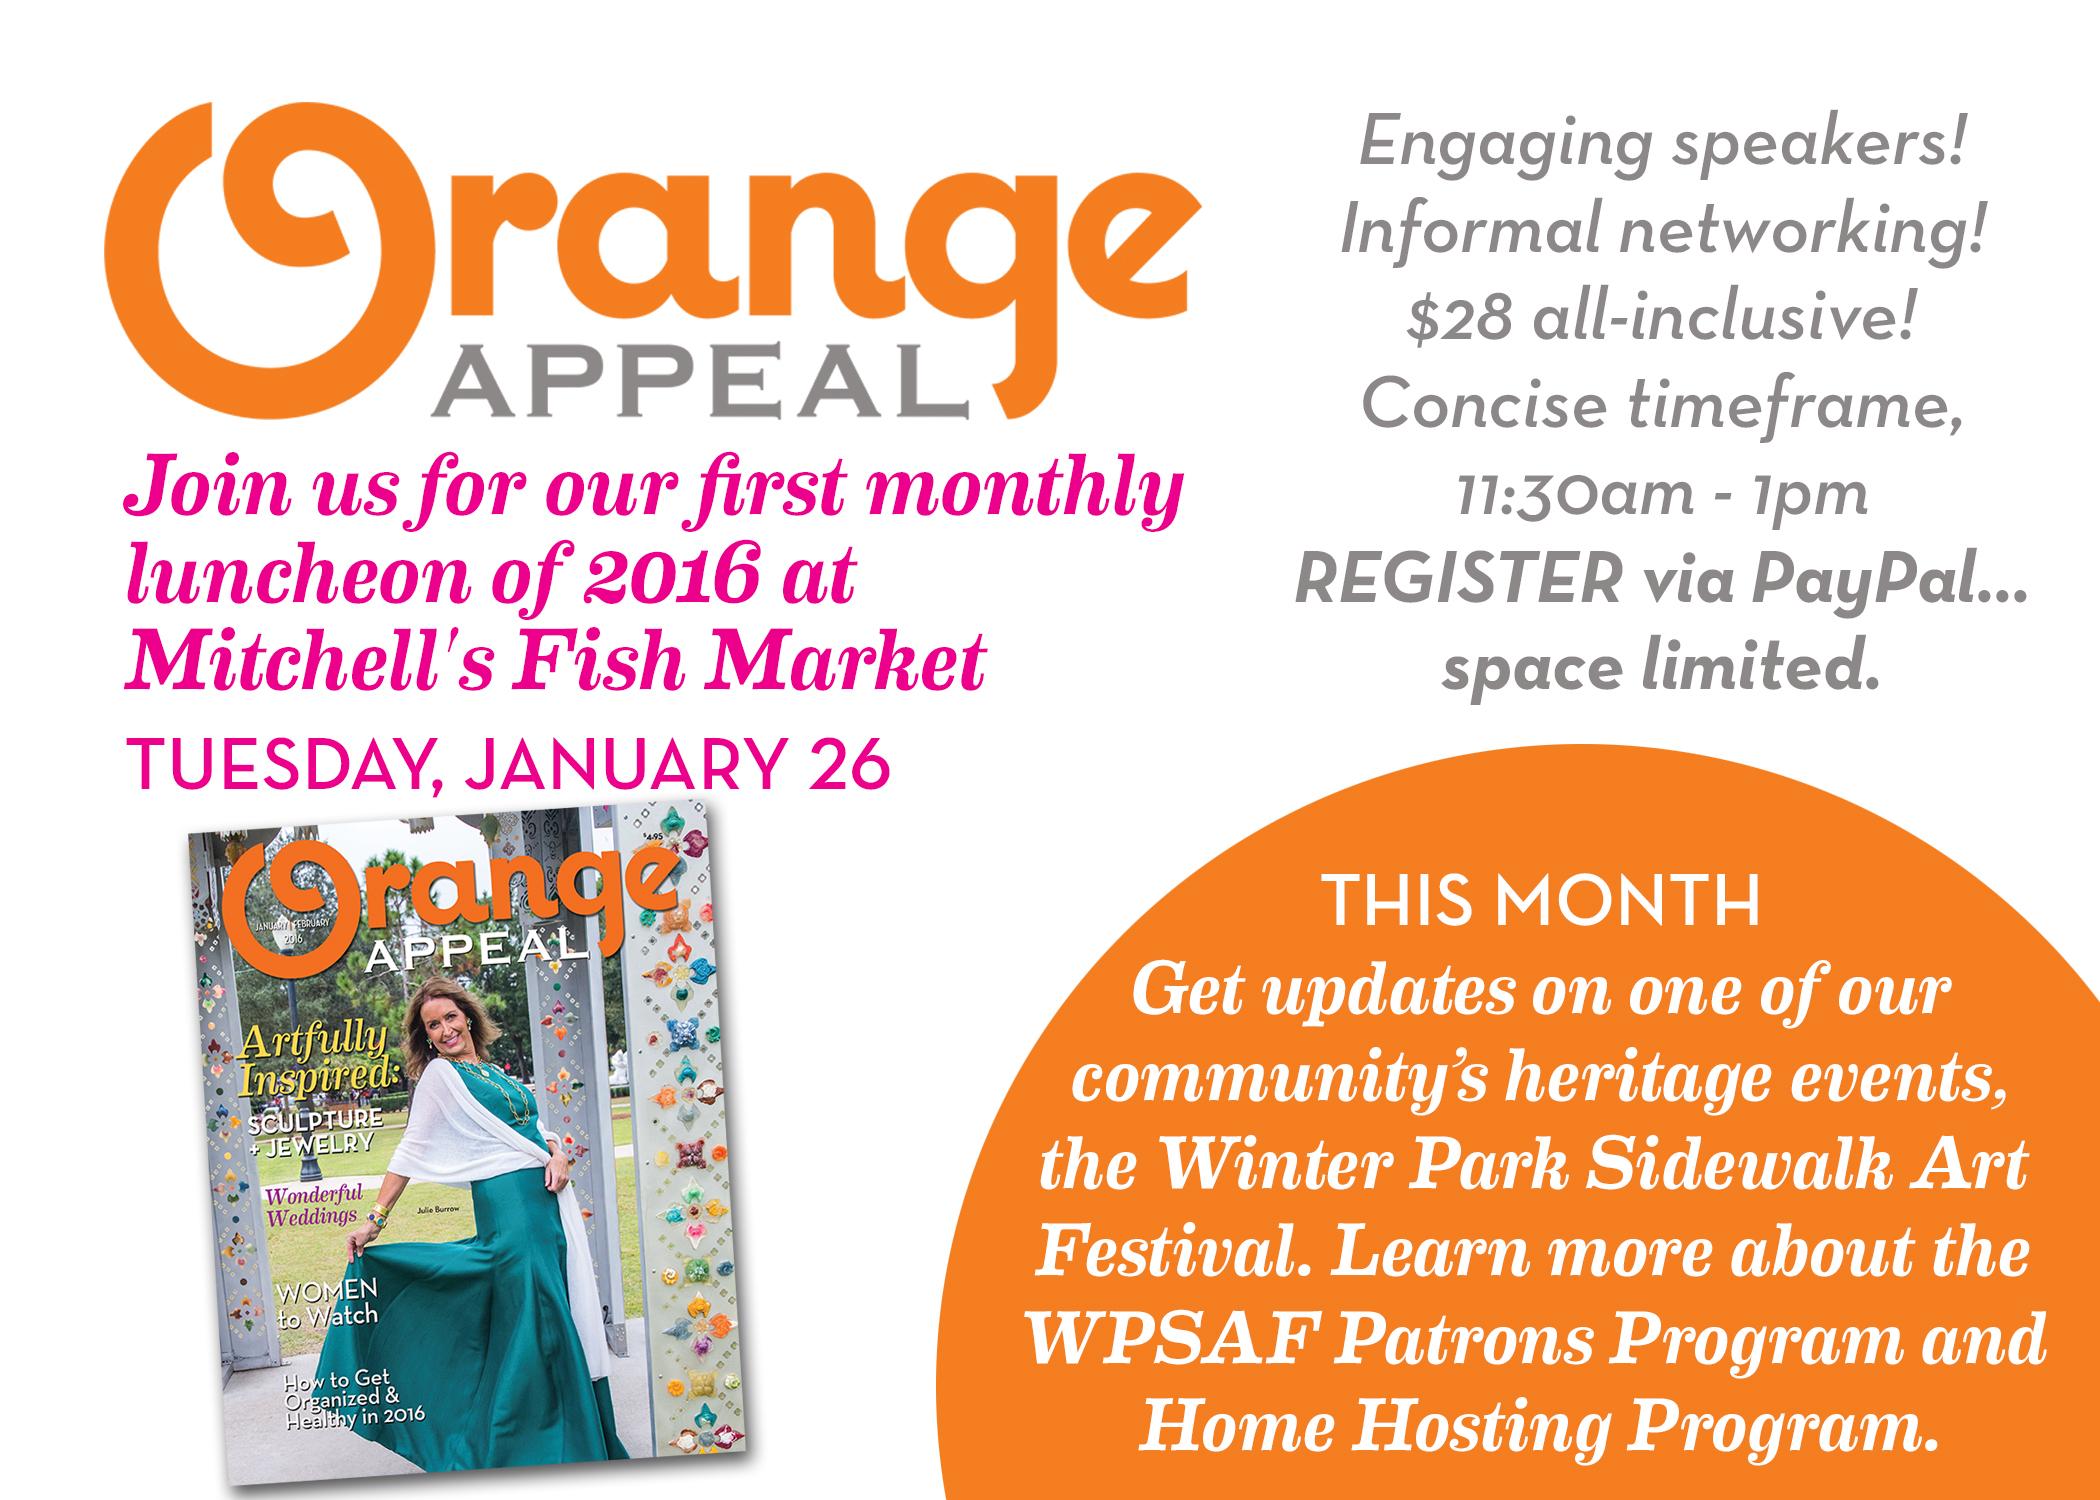 orange appeal luncheon 2016